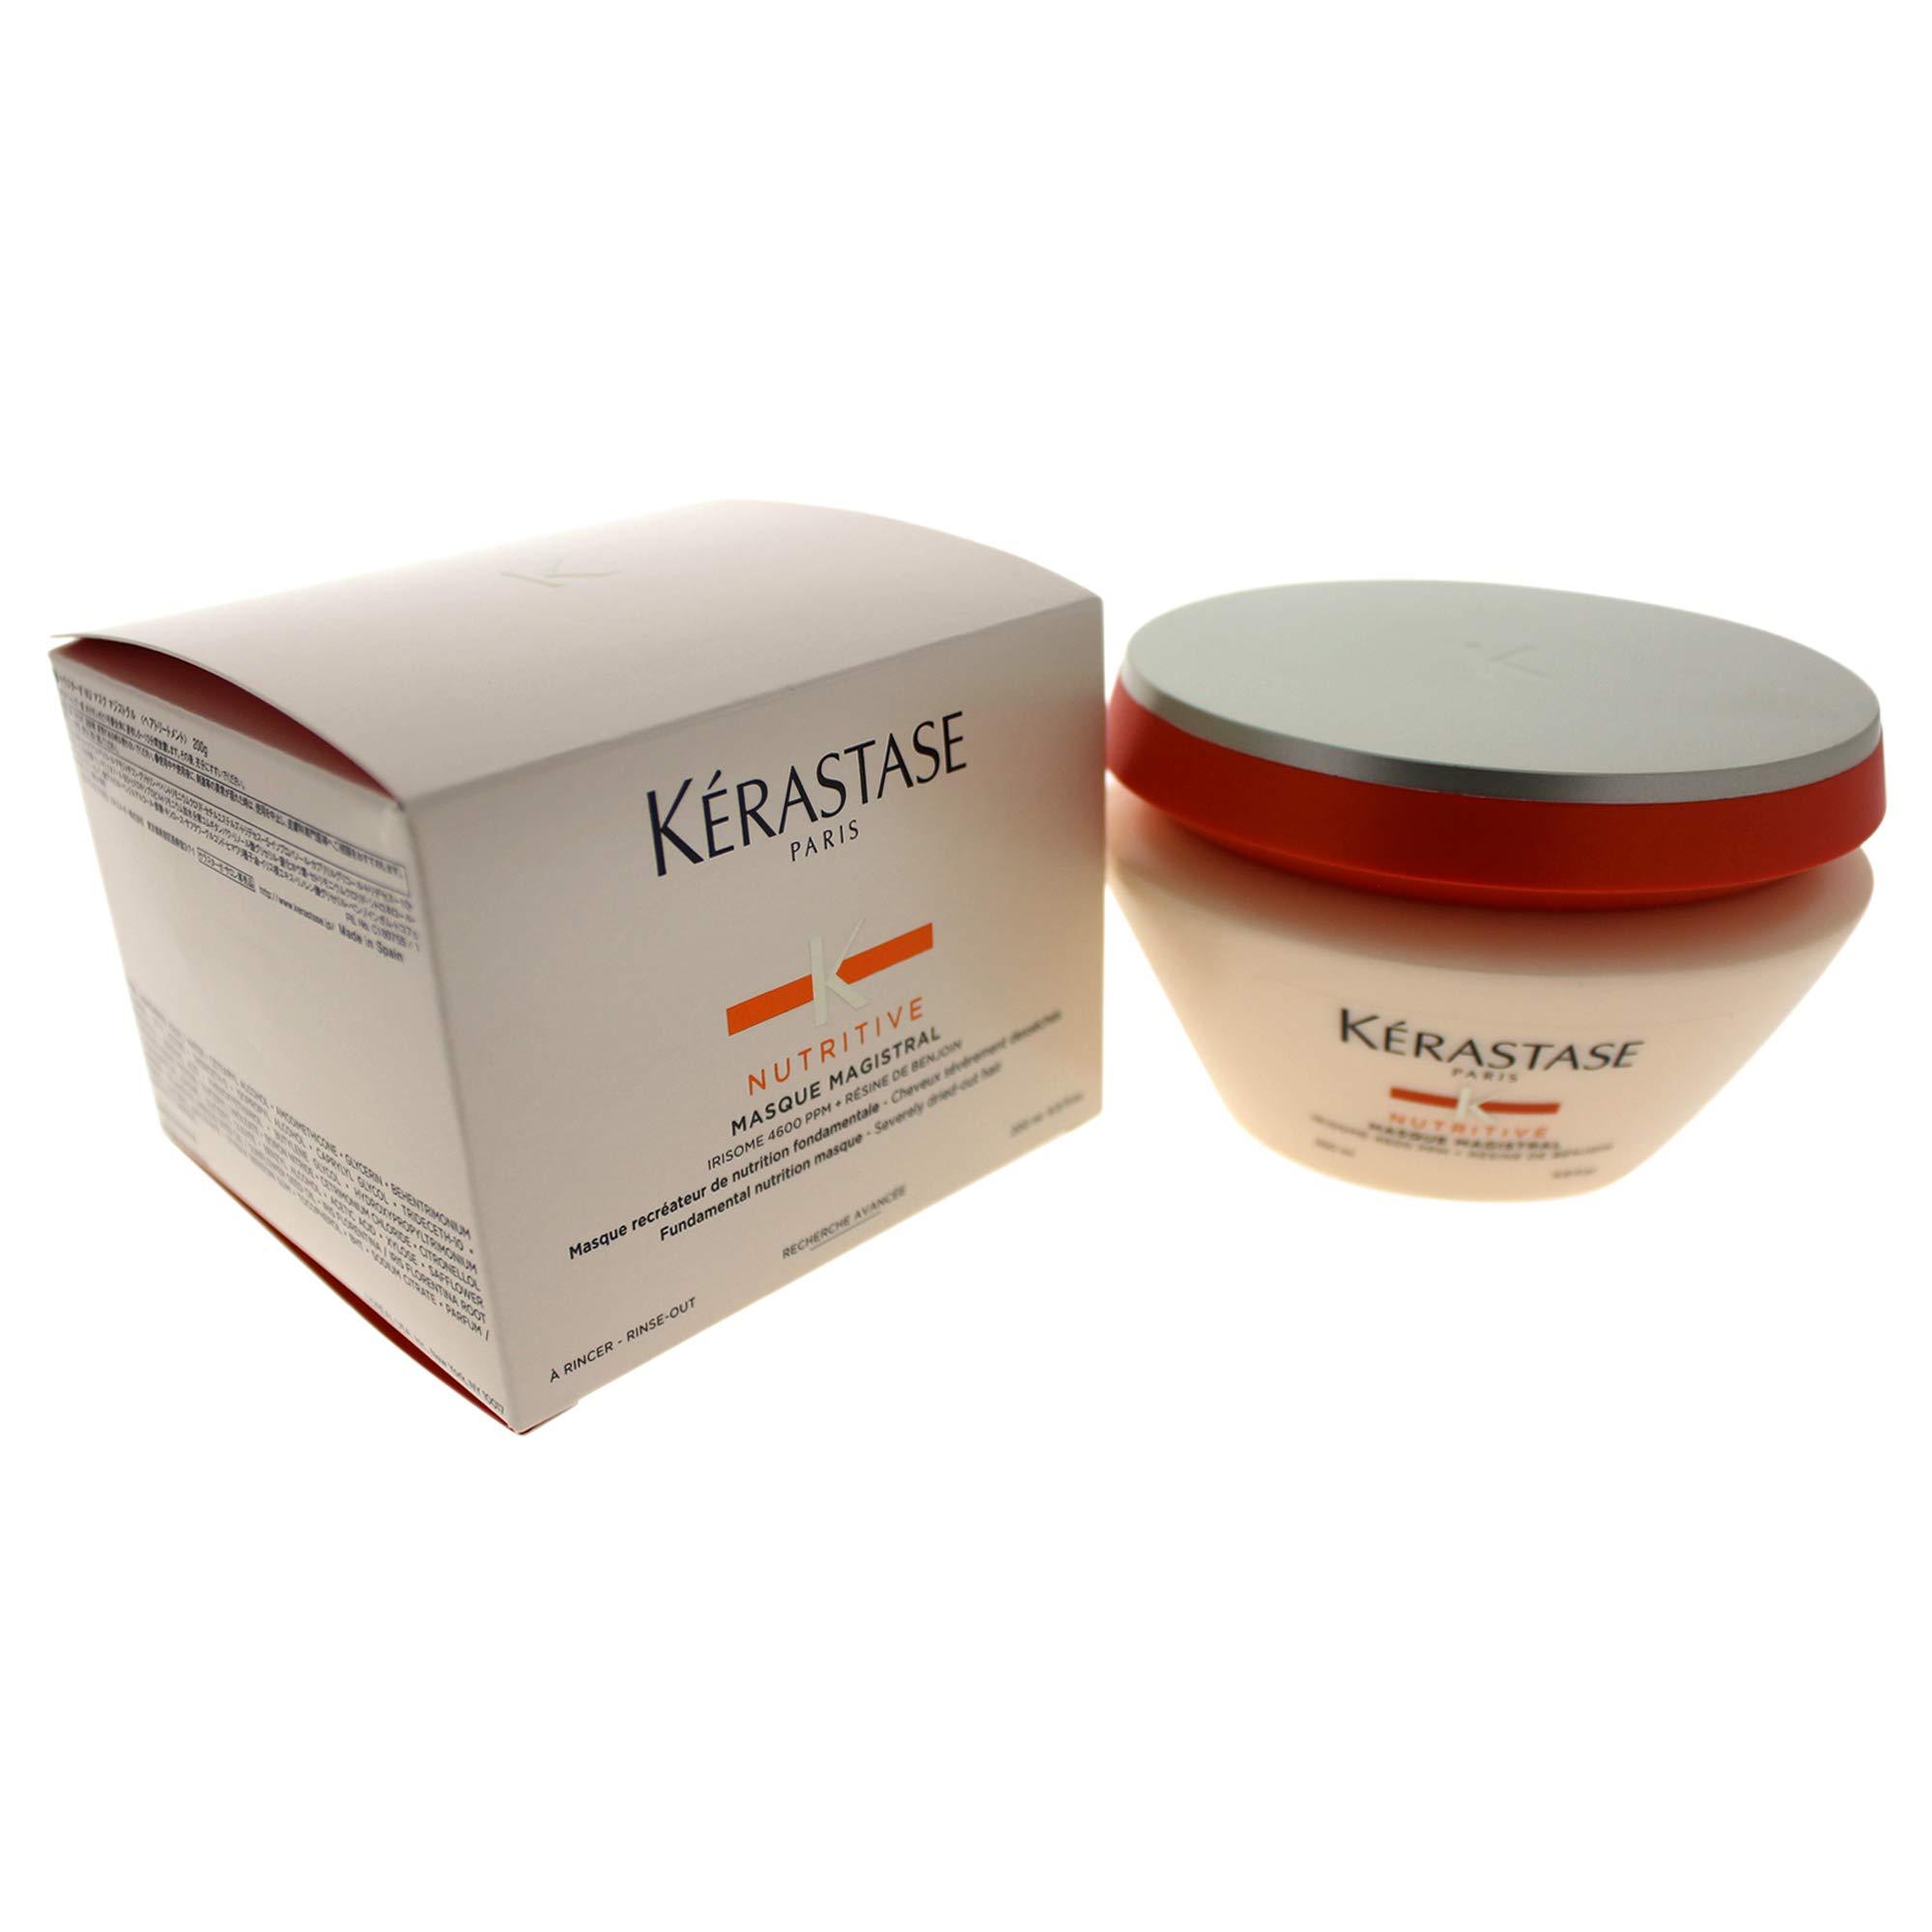 KERASTASE Nutritive Masque Magistral Mask, 6.8 Ounce